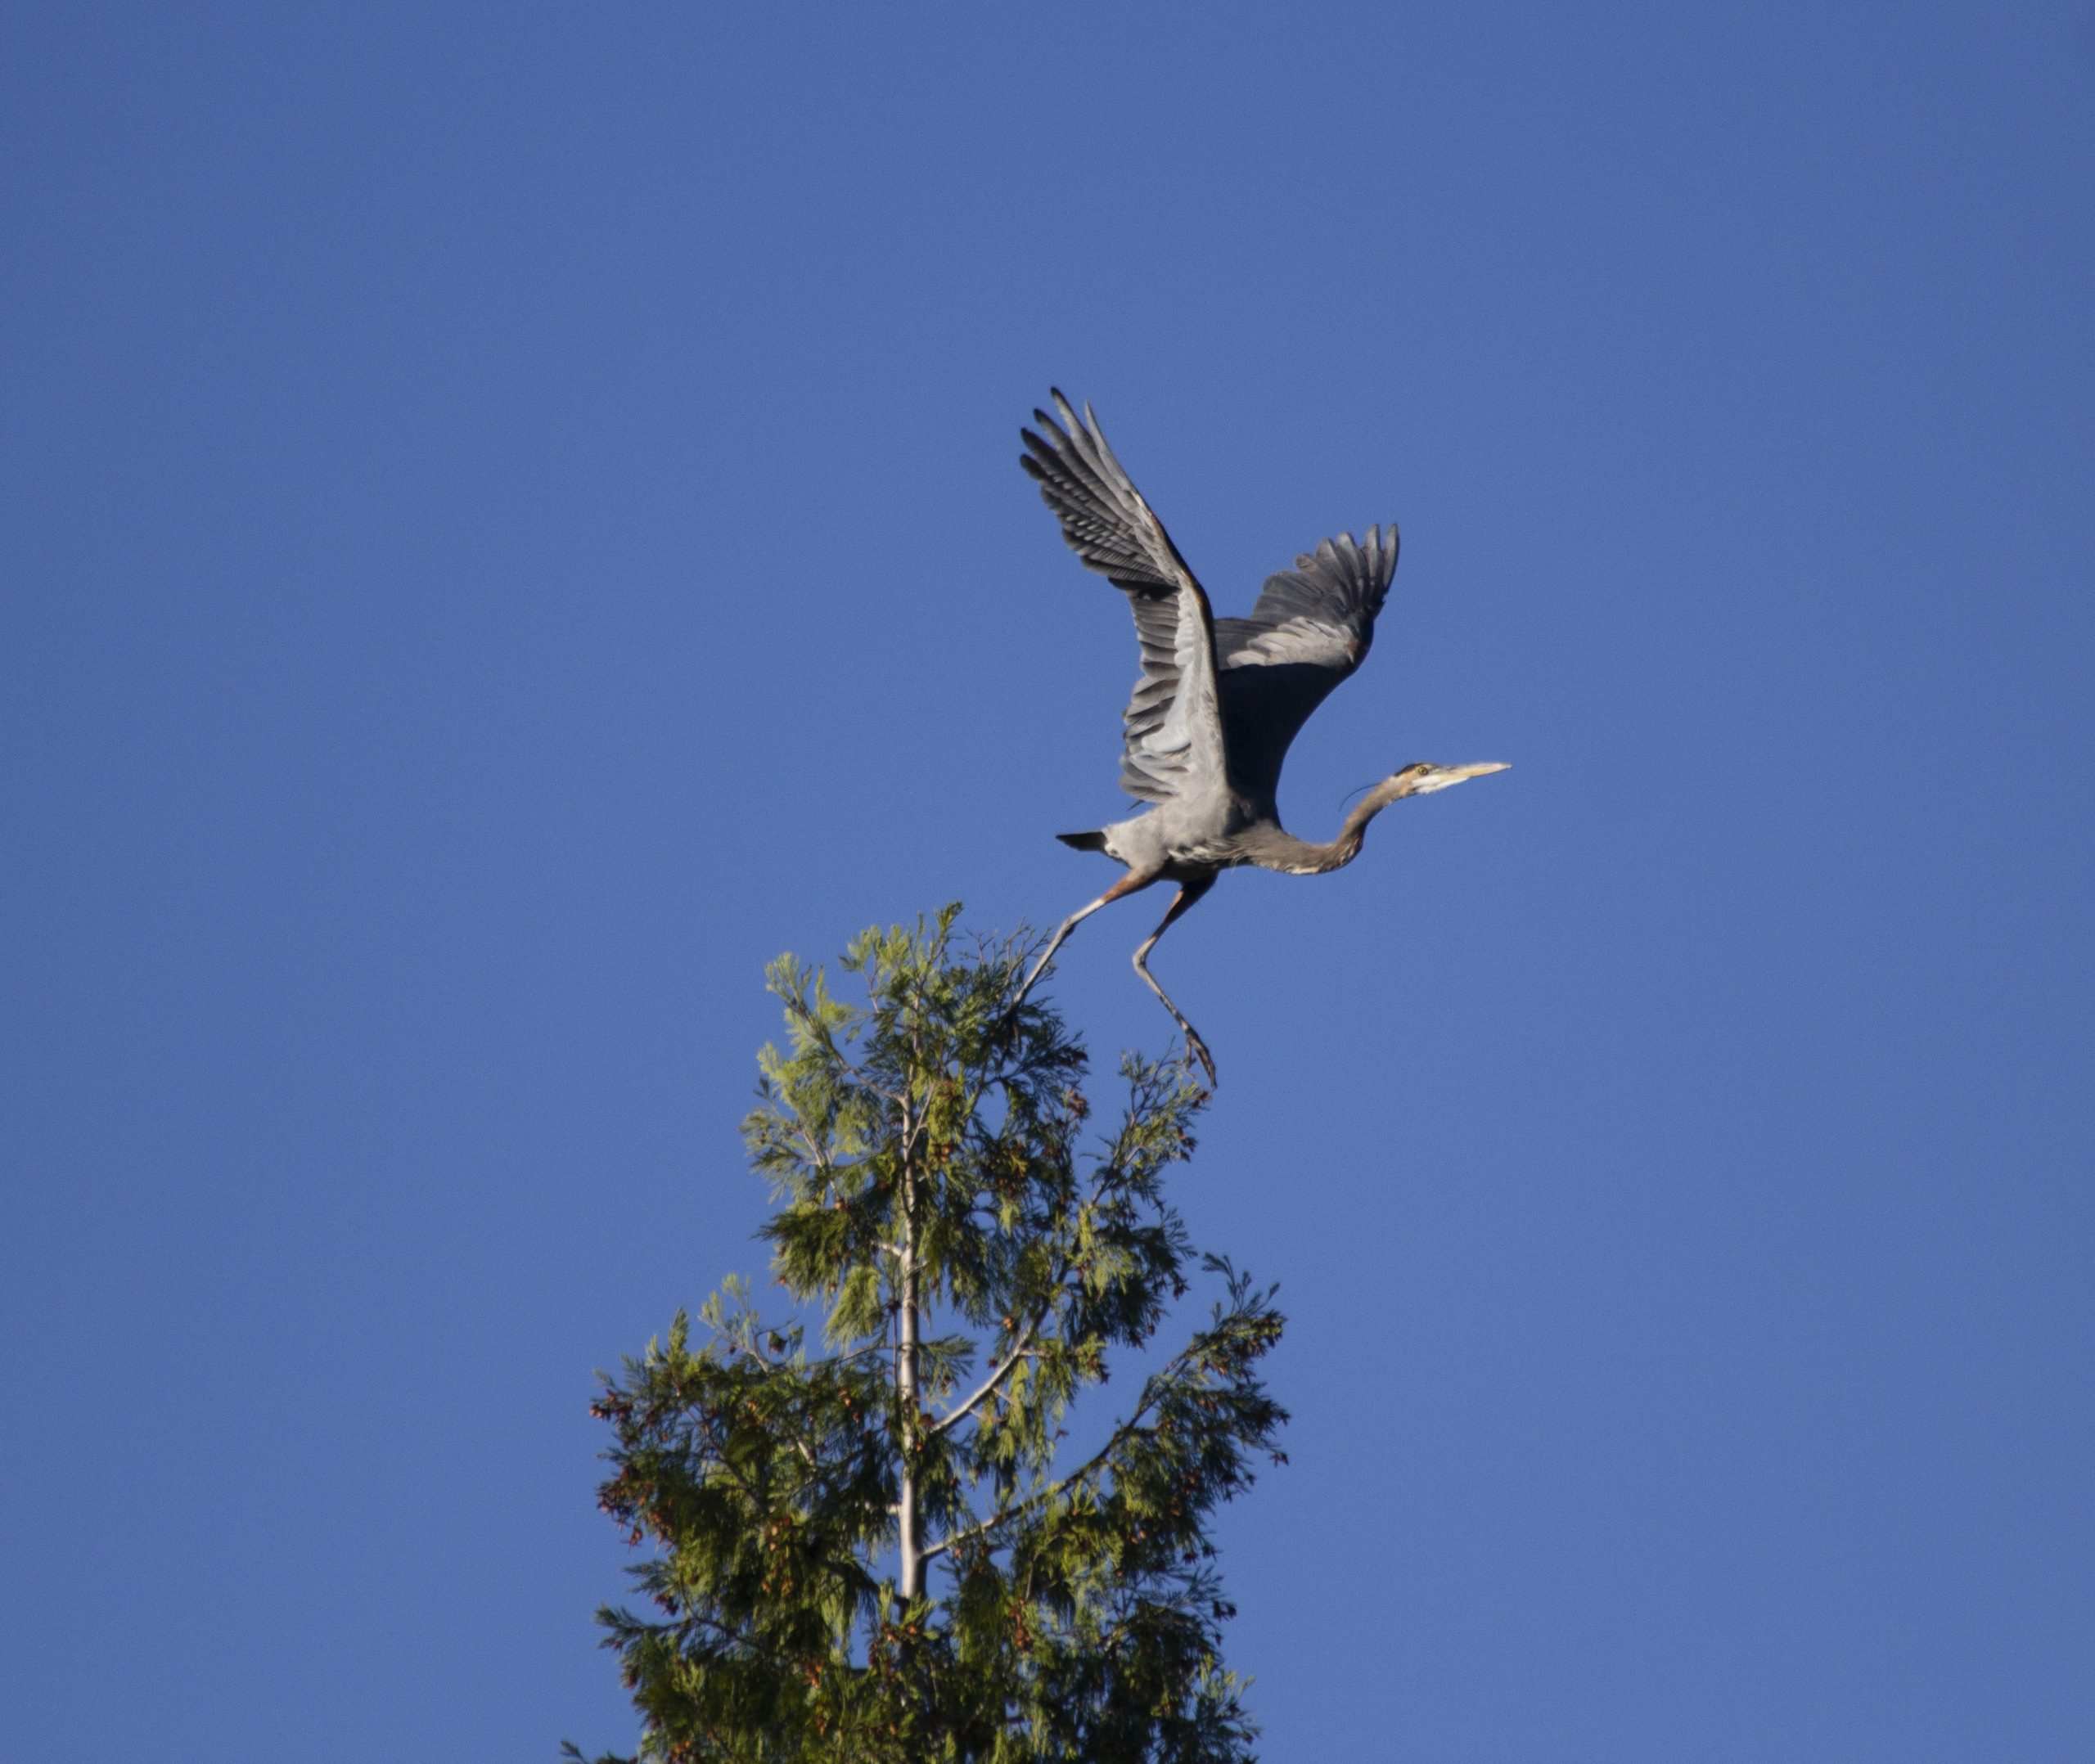 Great Blue Heron taking flight.